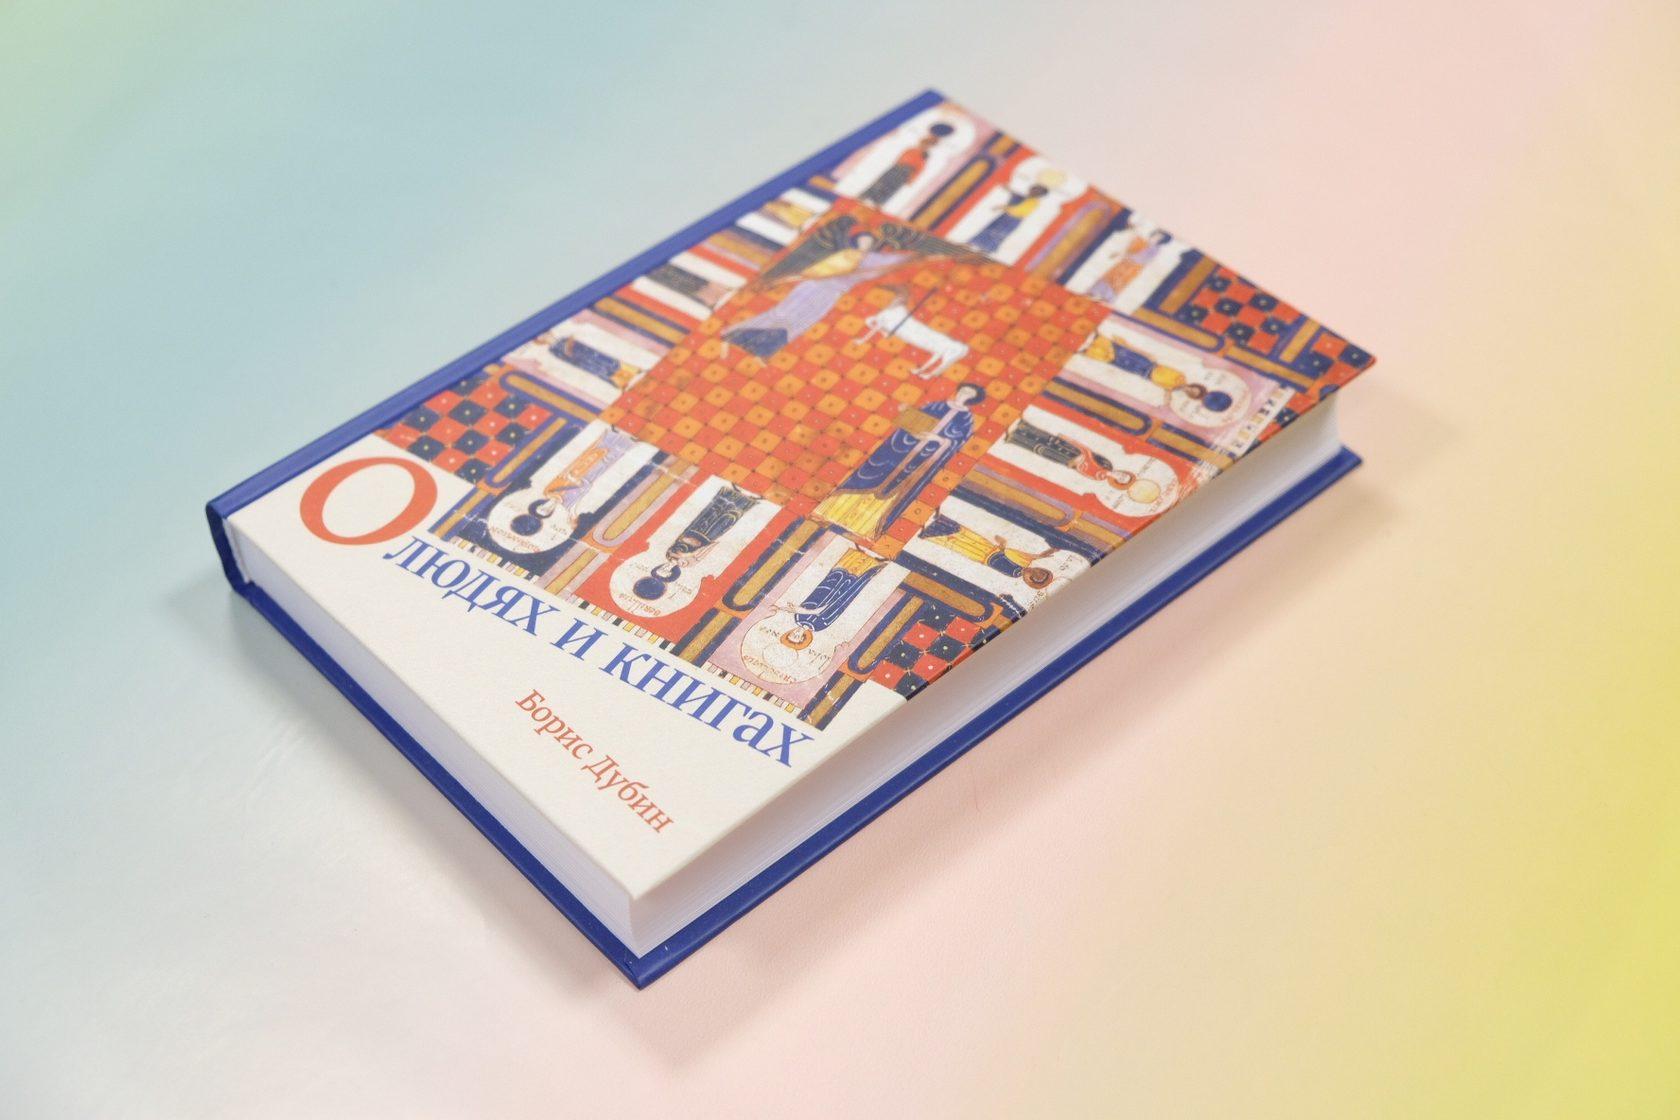 Борис Дубин «О людях и книгах: эссе»